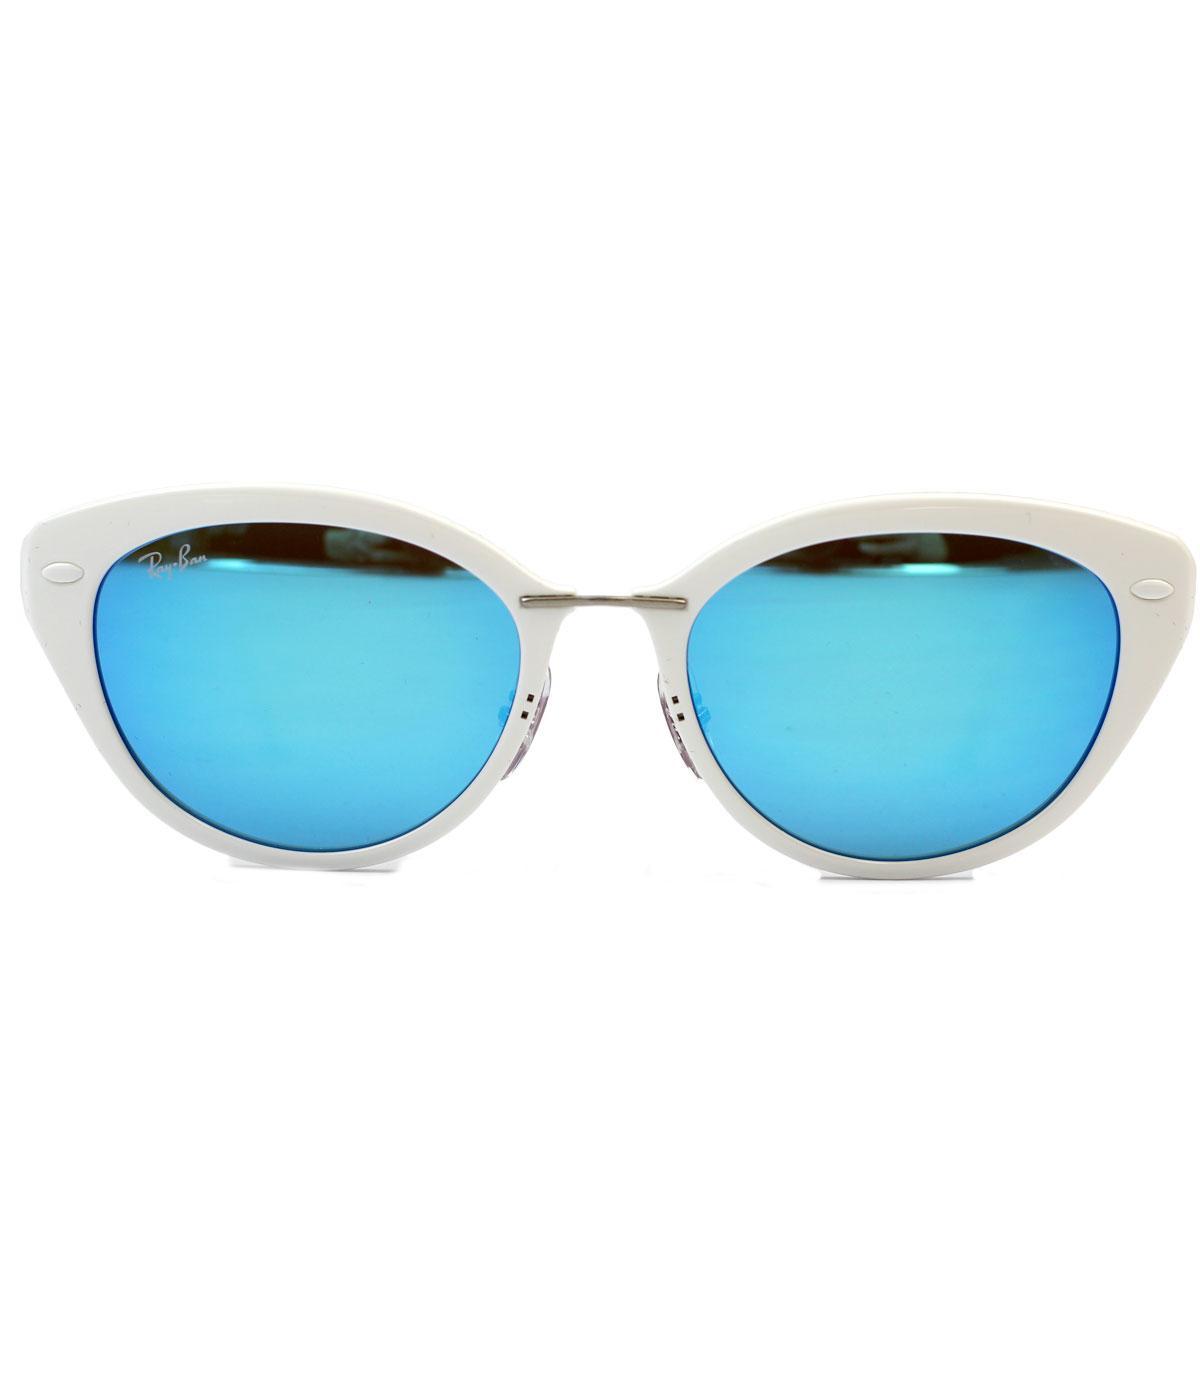 Catseye Tech RAY-BAN Retro Vintage 50s Sunglasses